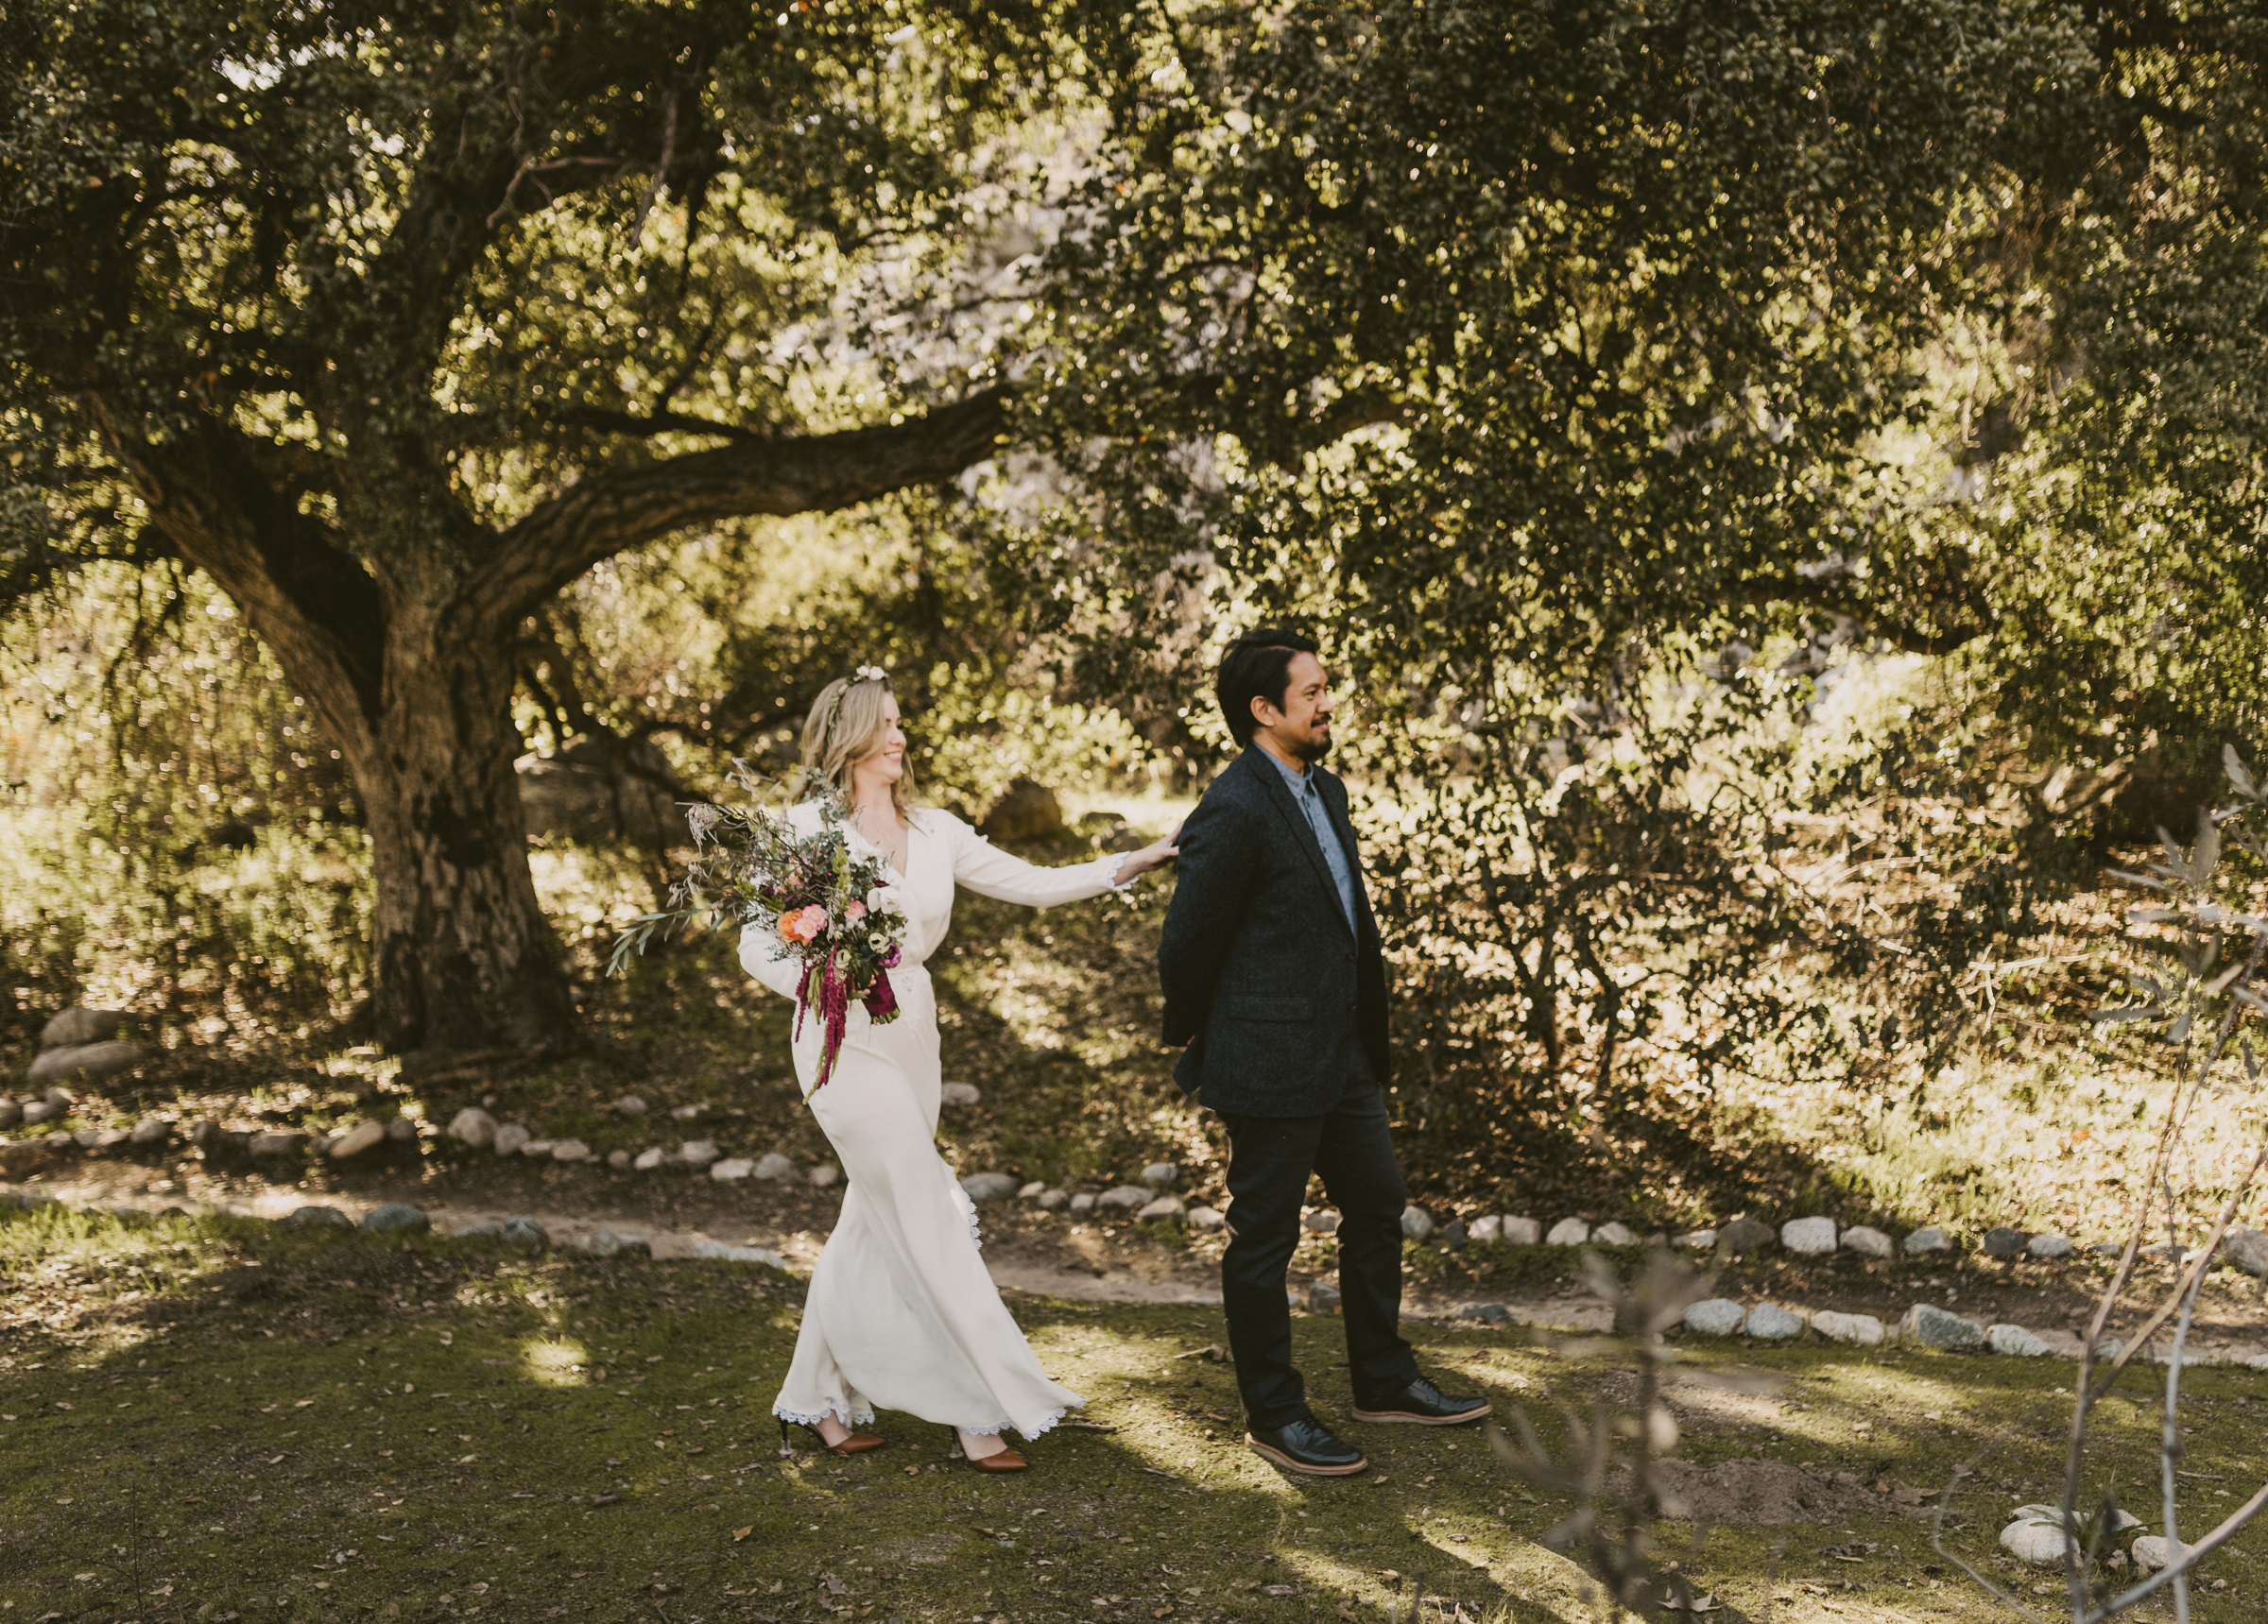 ©Isaiah + Taylor Photography - Intimate Elopement, Eaton Canyon, Los Angeles Wedding Photographer-9.jpg